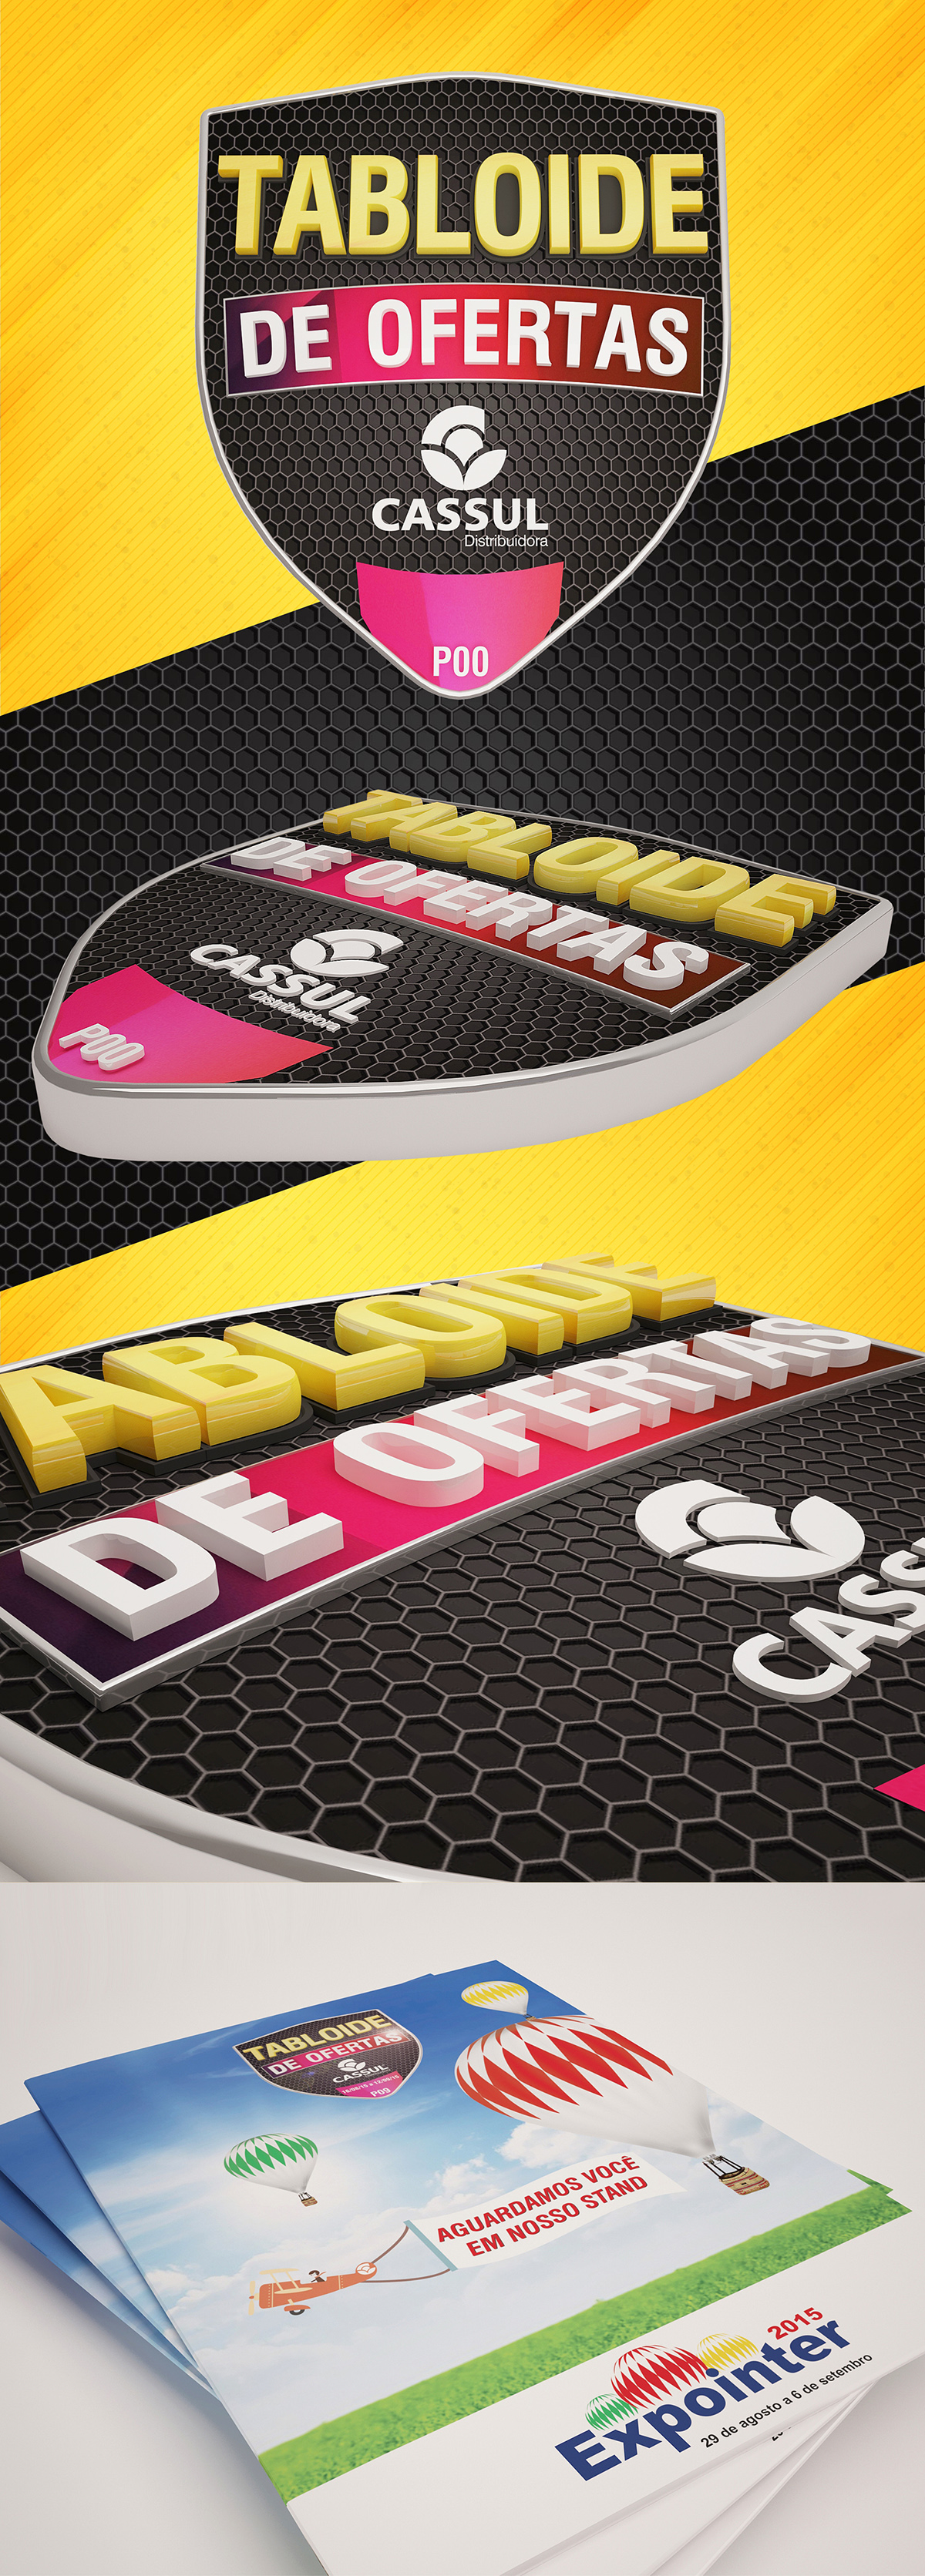 logo brasão Cassul tabloide 3D rendering